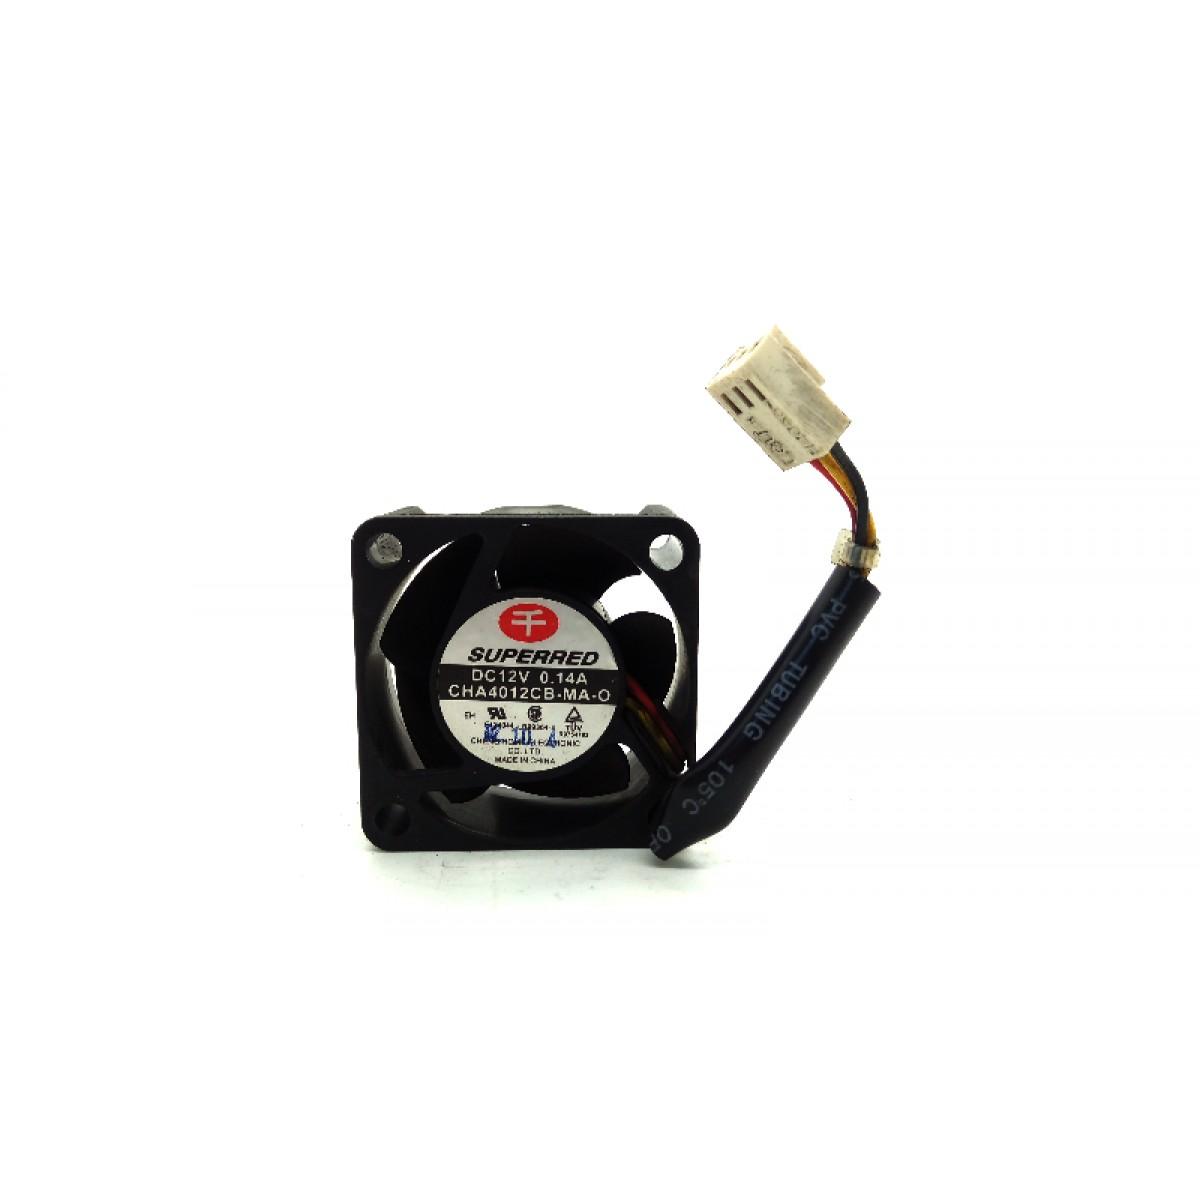 Superred Cha4012Cb-Ma-O Fan Assy Dc12V .14A 3-Wire